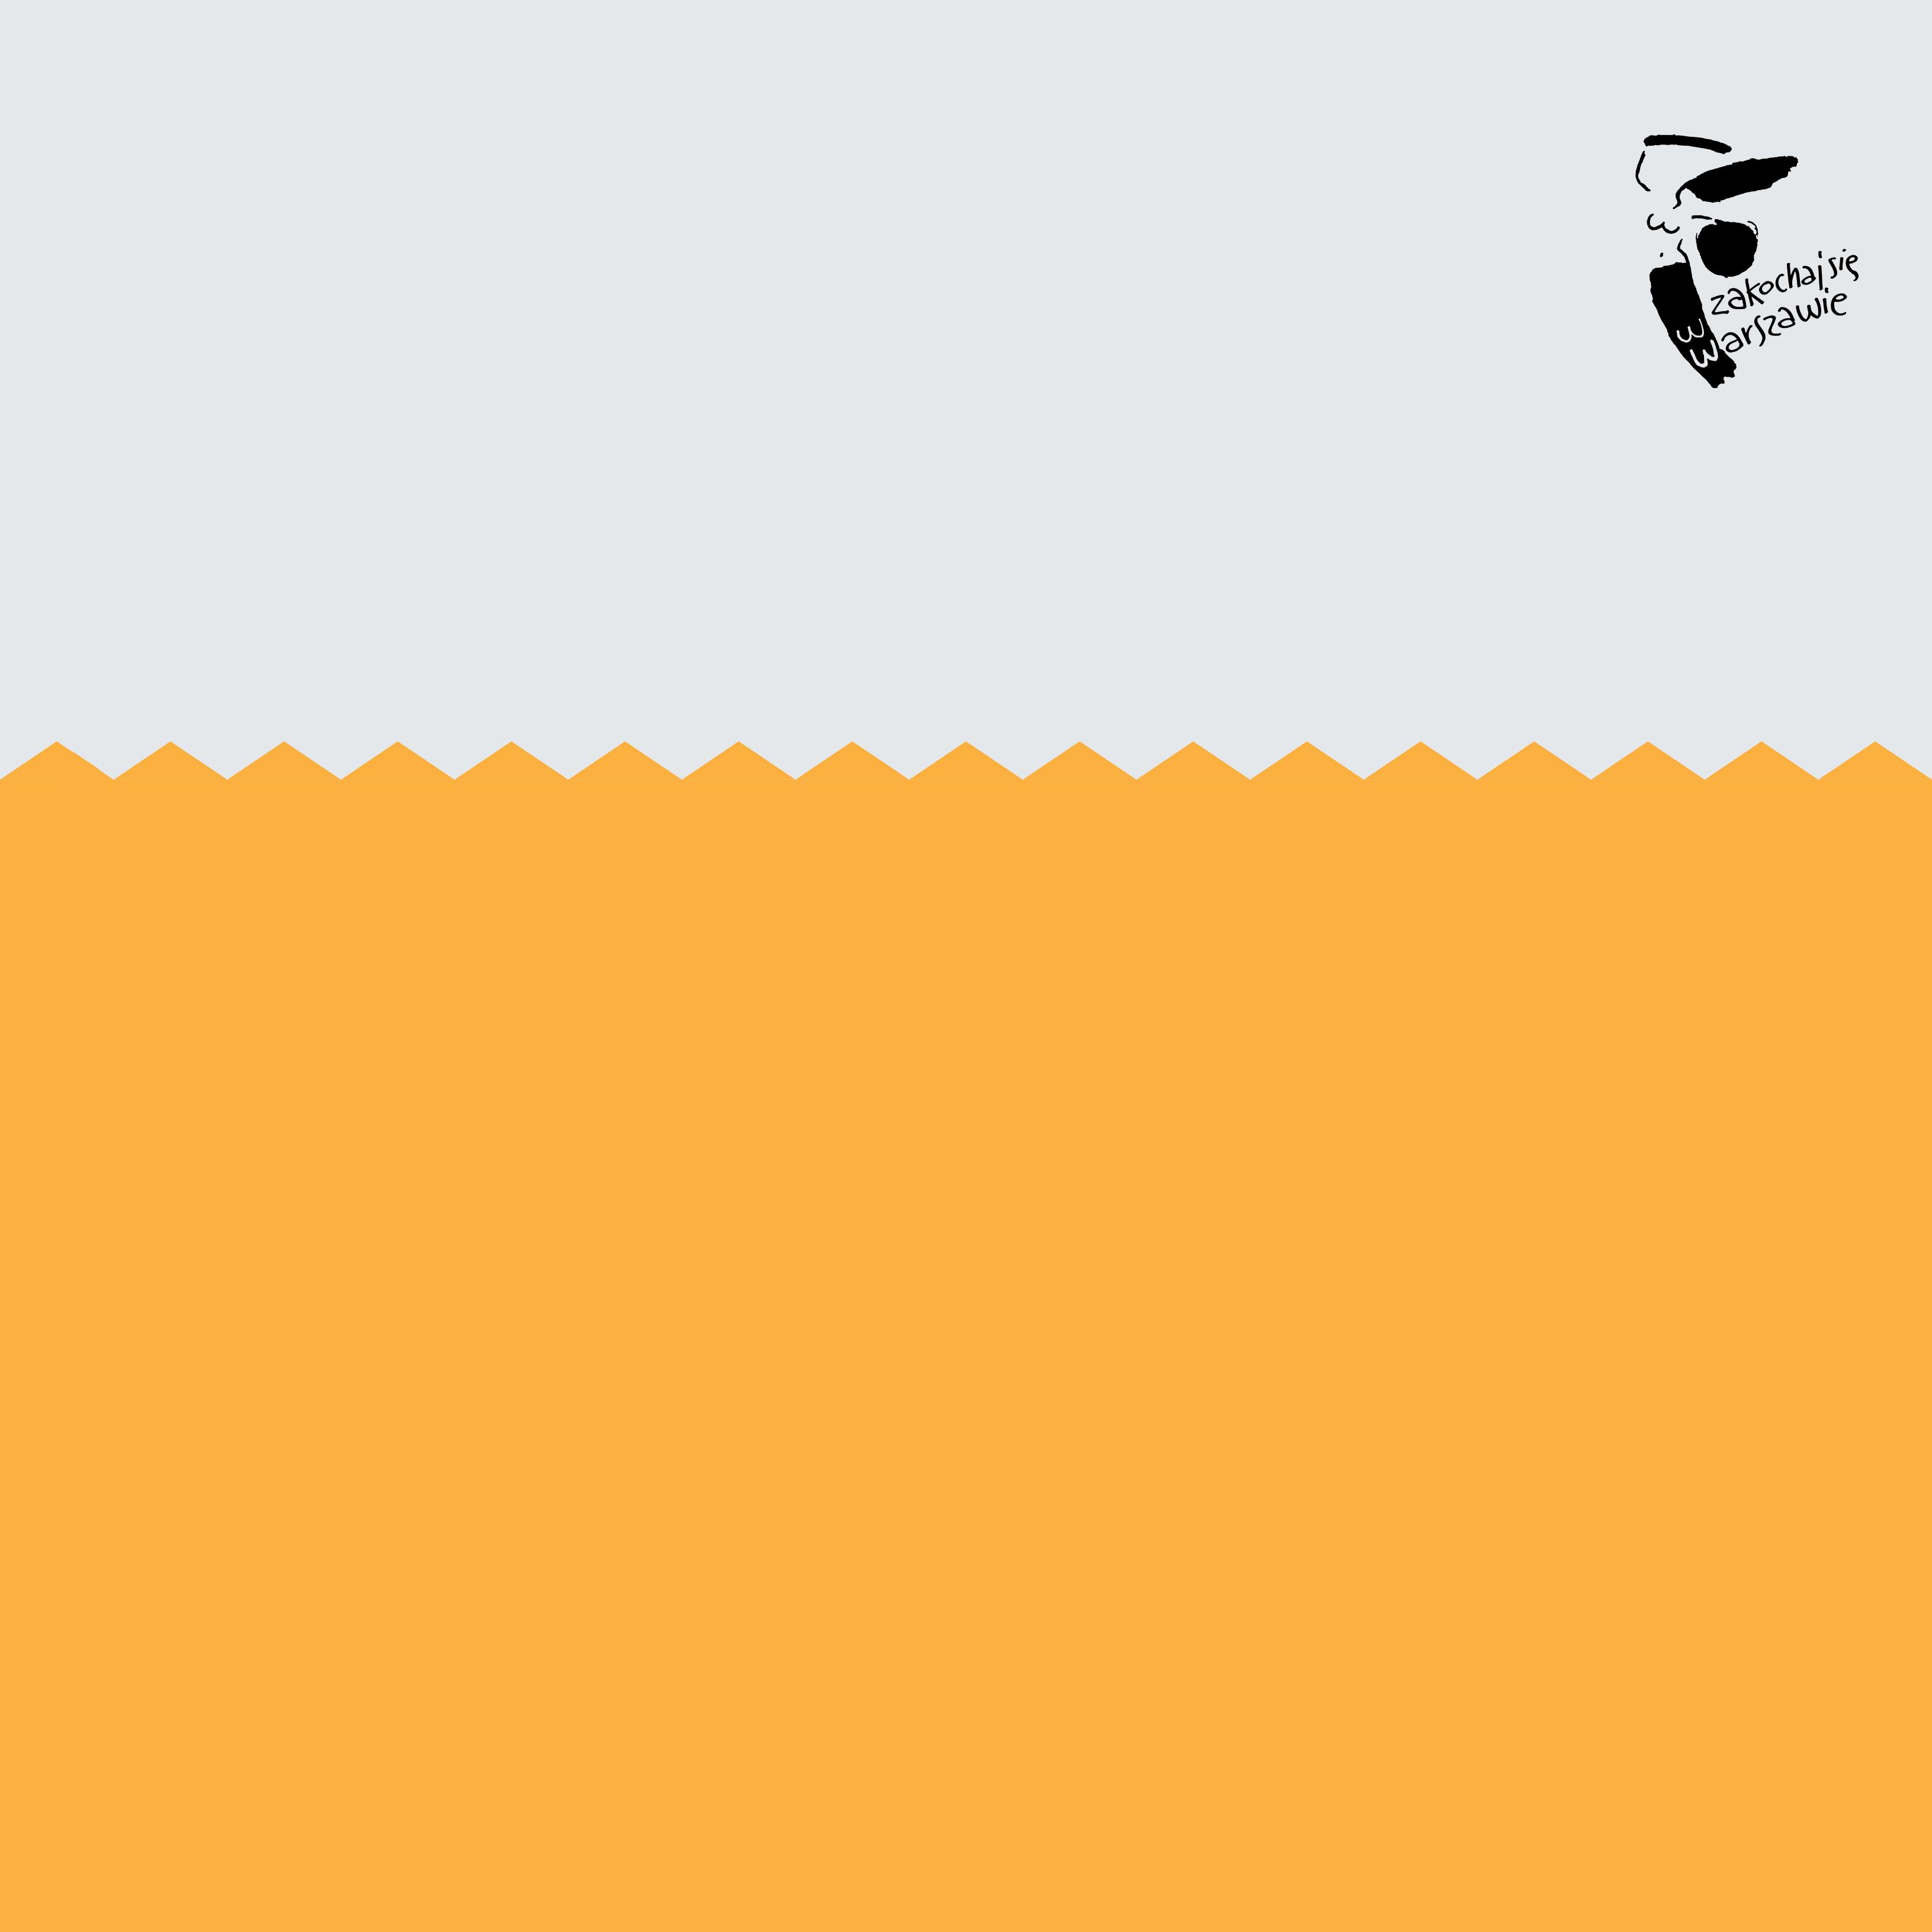 "Zaproszenie na spotkanie online ""Praskie Centrum RE-START"", 31 marca godzina 18:00 na platformie zoom, zapisy na restart@um.warszawa.pl"